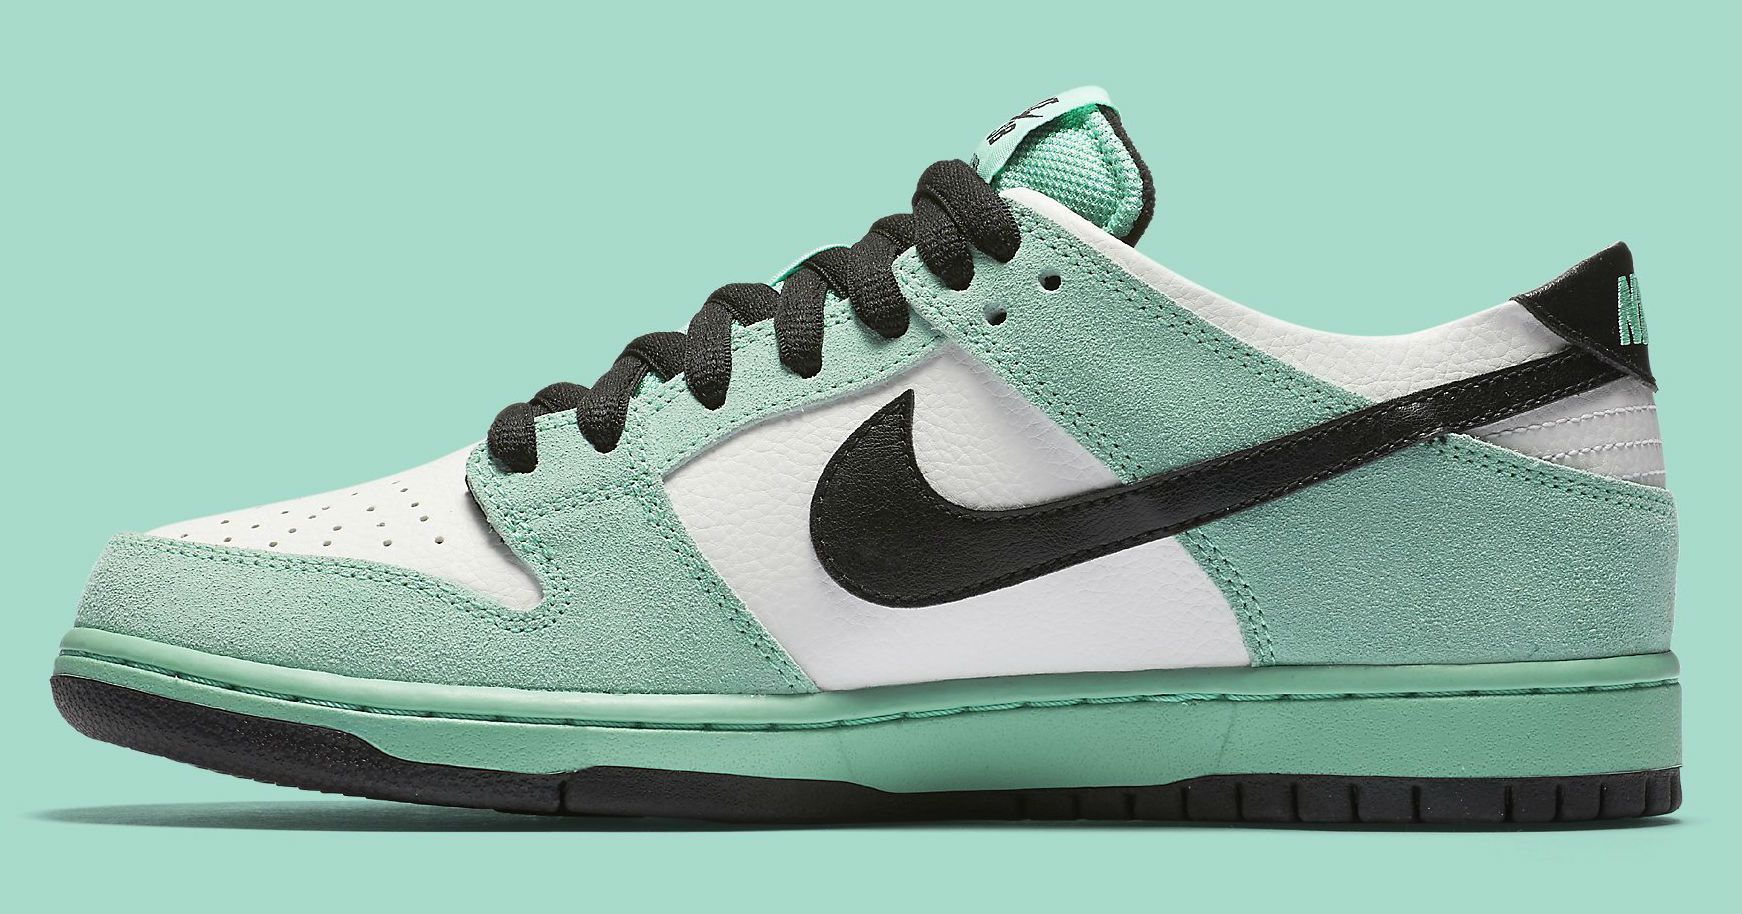 Nike SB Dunk Low Sea Crystal 819674-301